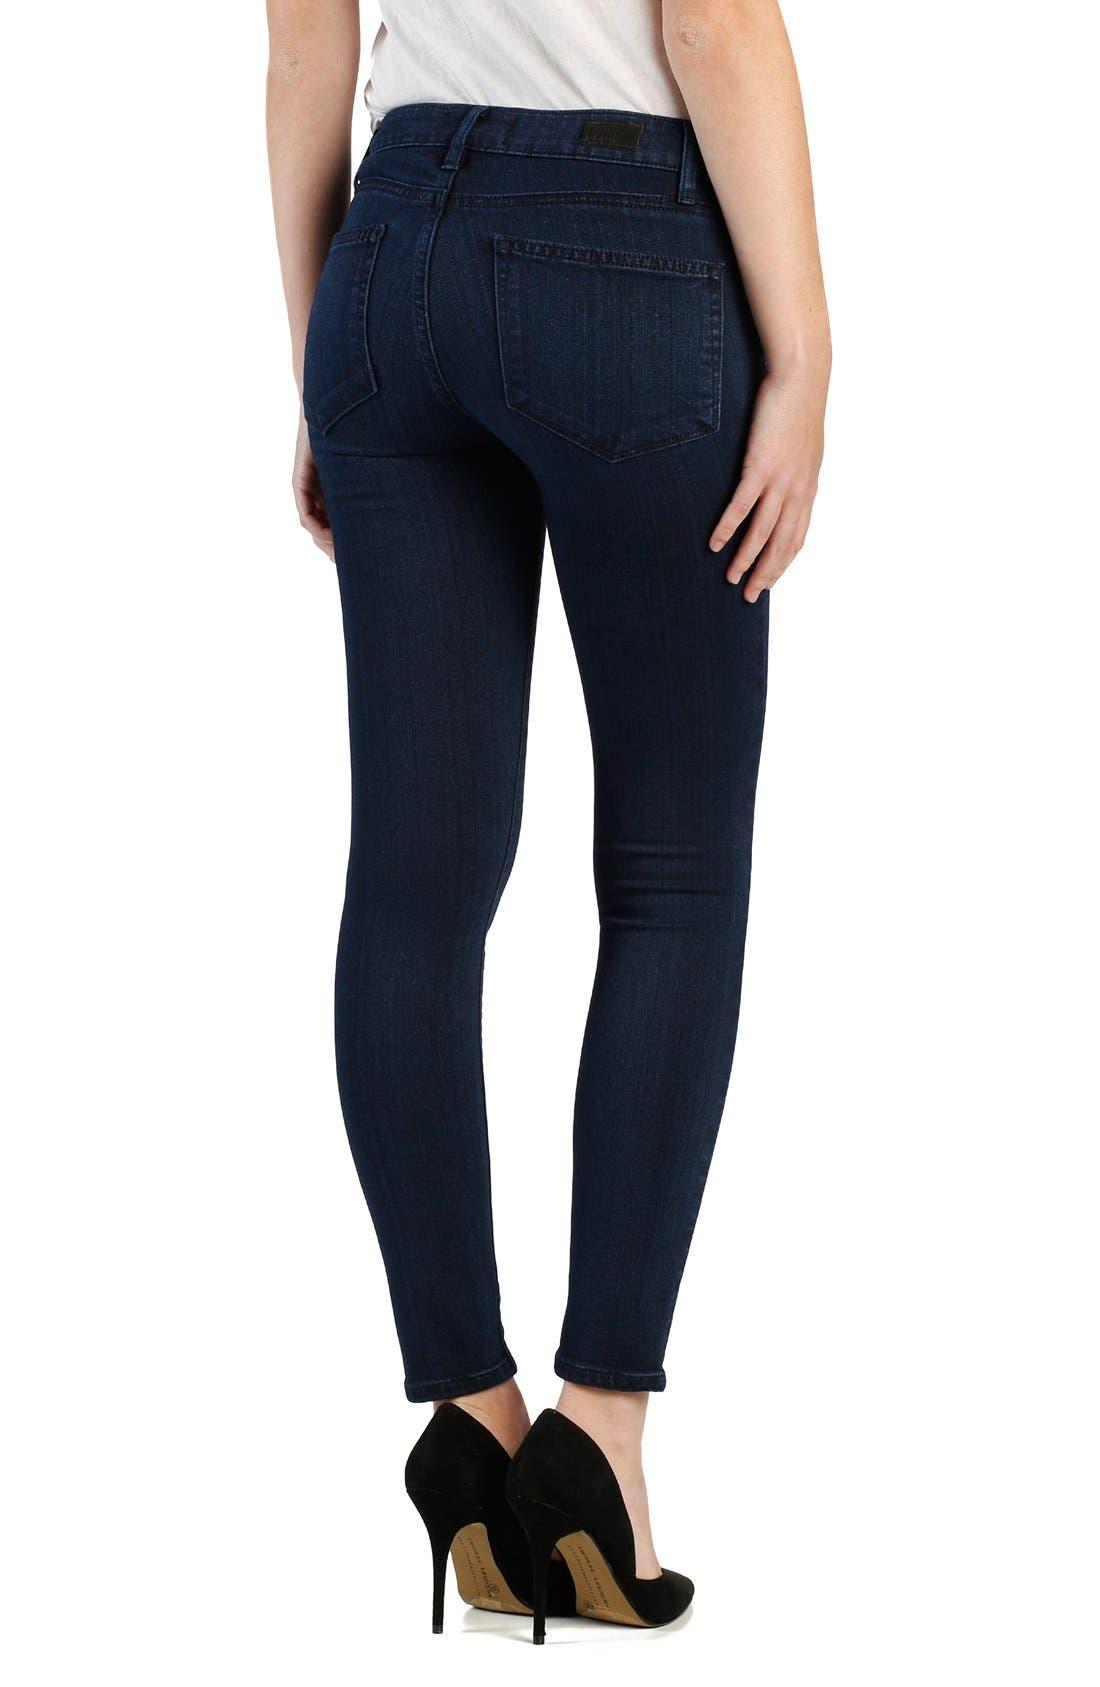 Alternate Image 2  - PAIGE 'Transcend - Verdugo' Ultra Skinny AnkleJeans (Holly)